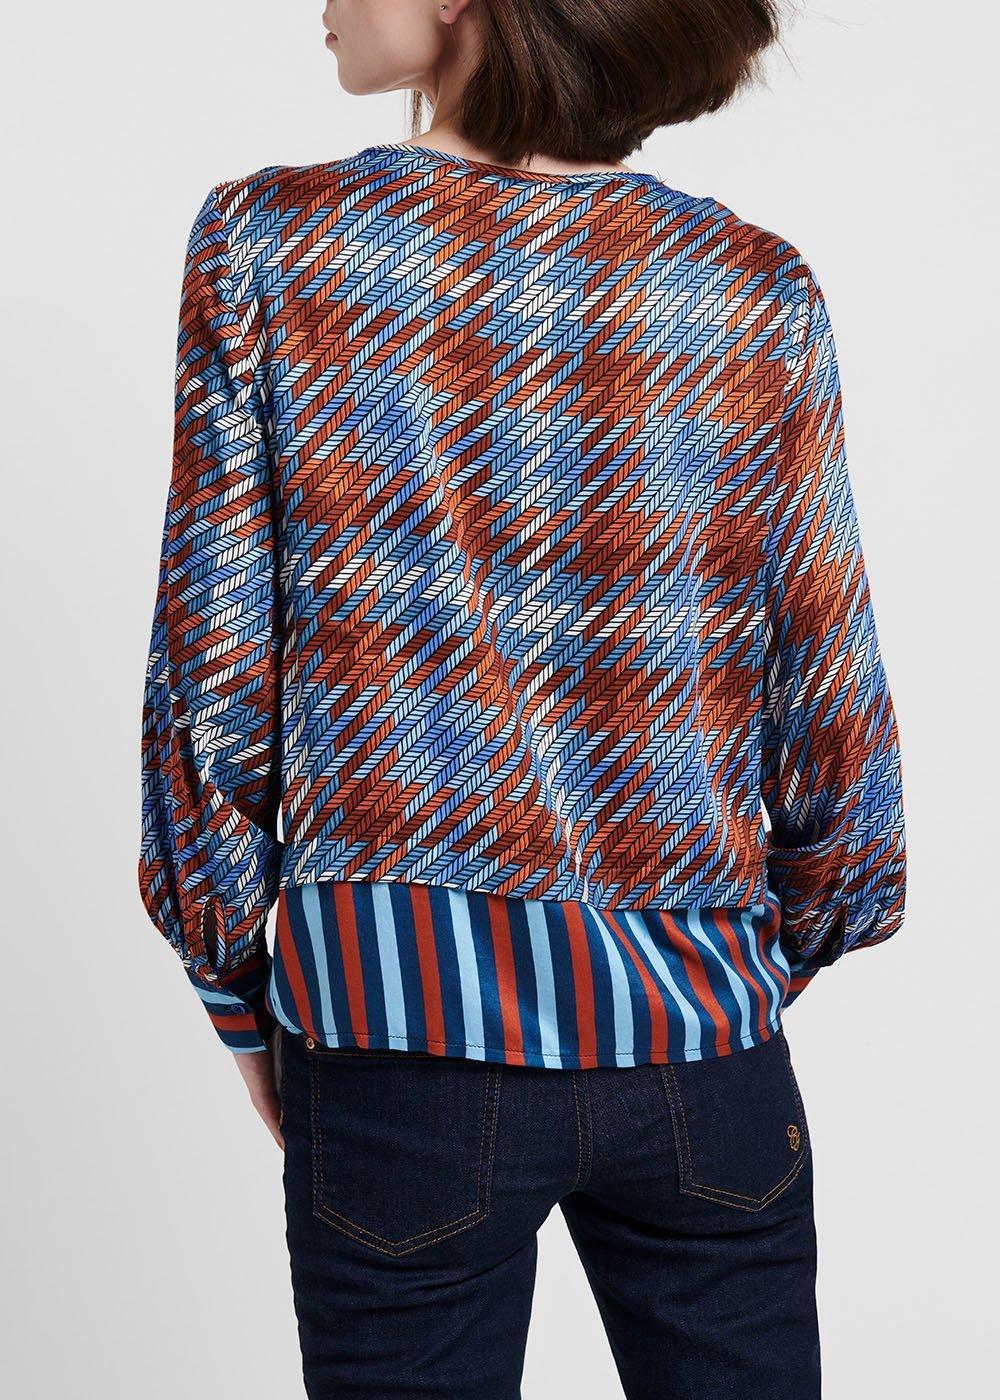 Double patterned faux - satin blouse - Avion / Ruggine Fantasia - Woman